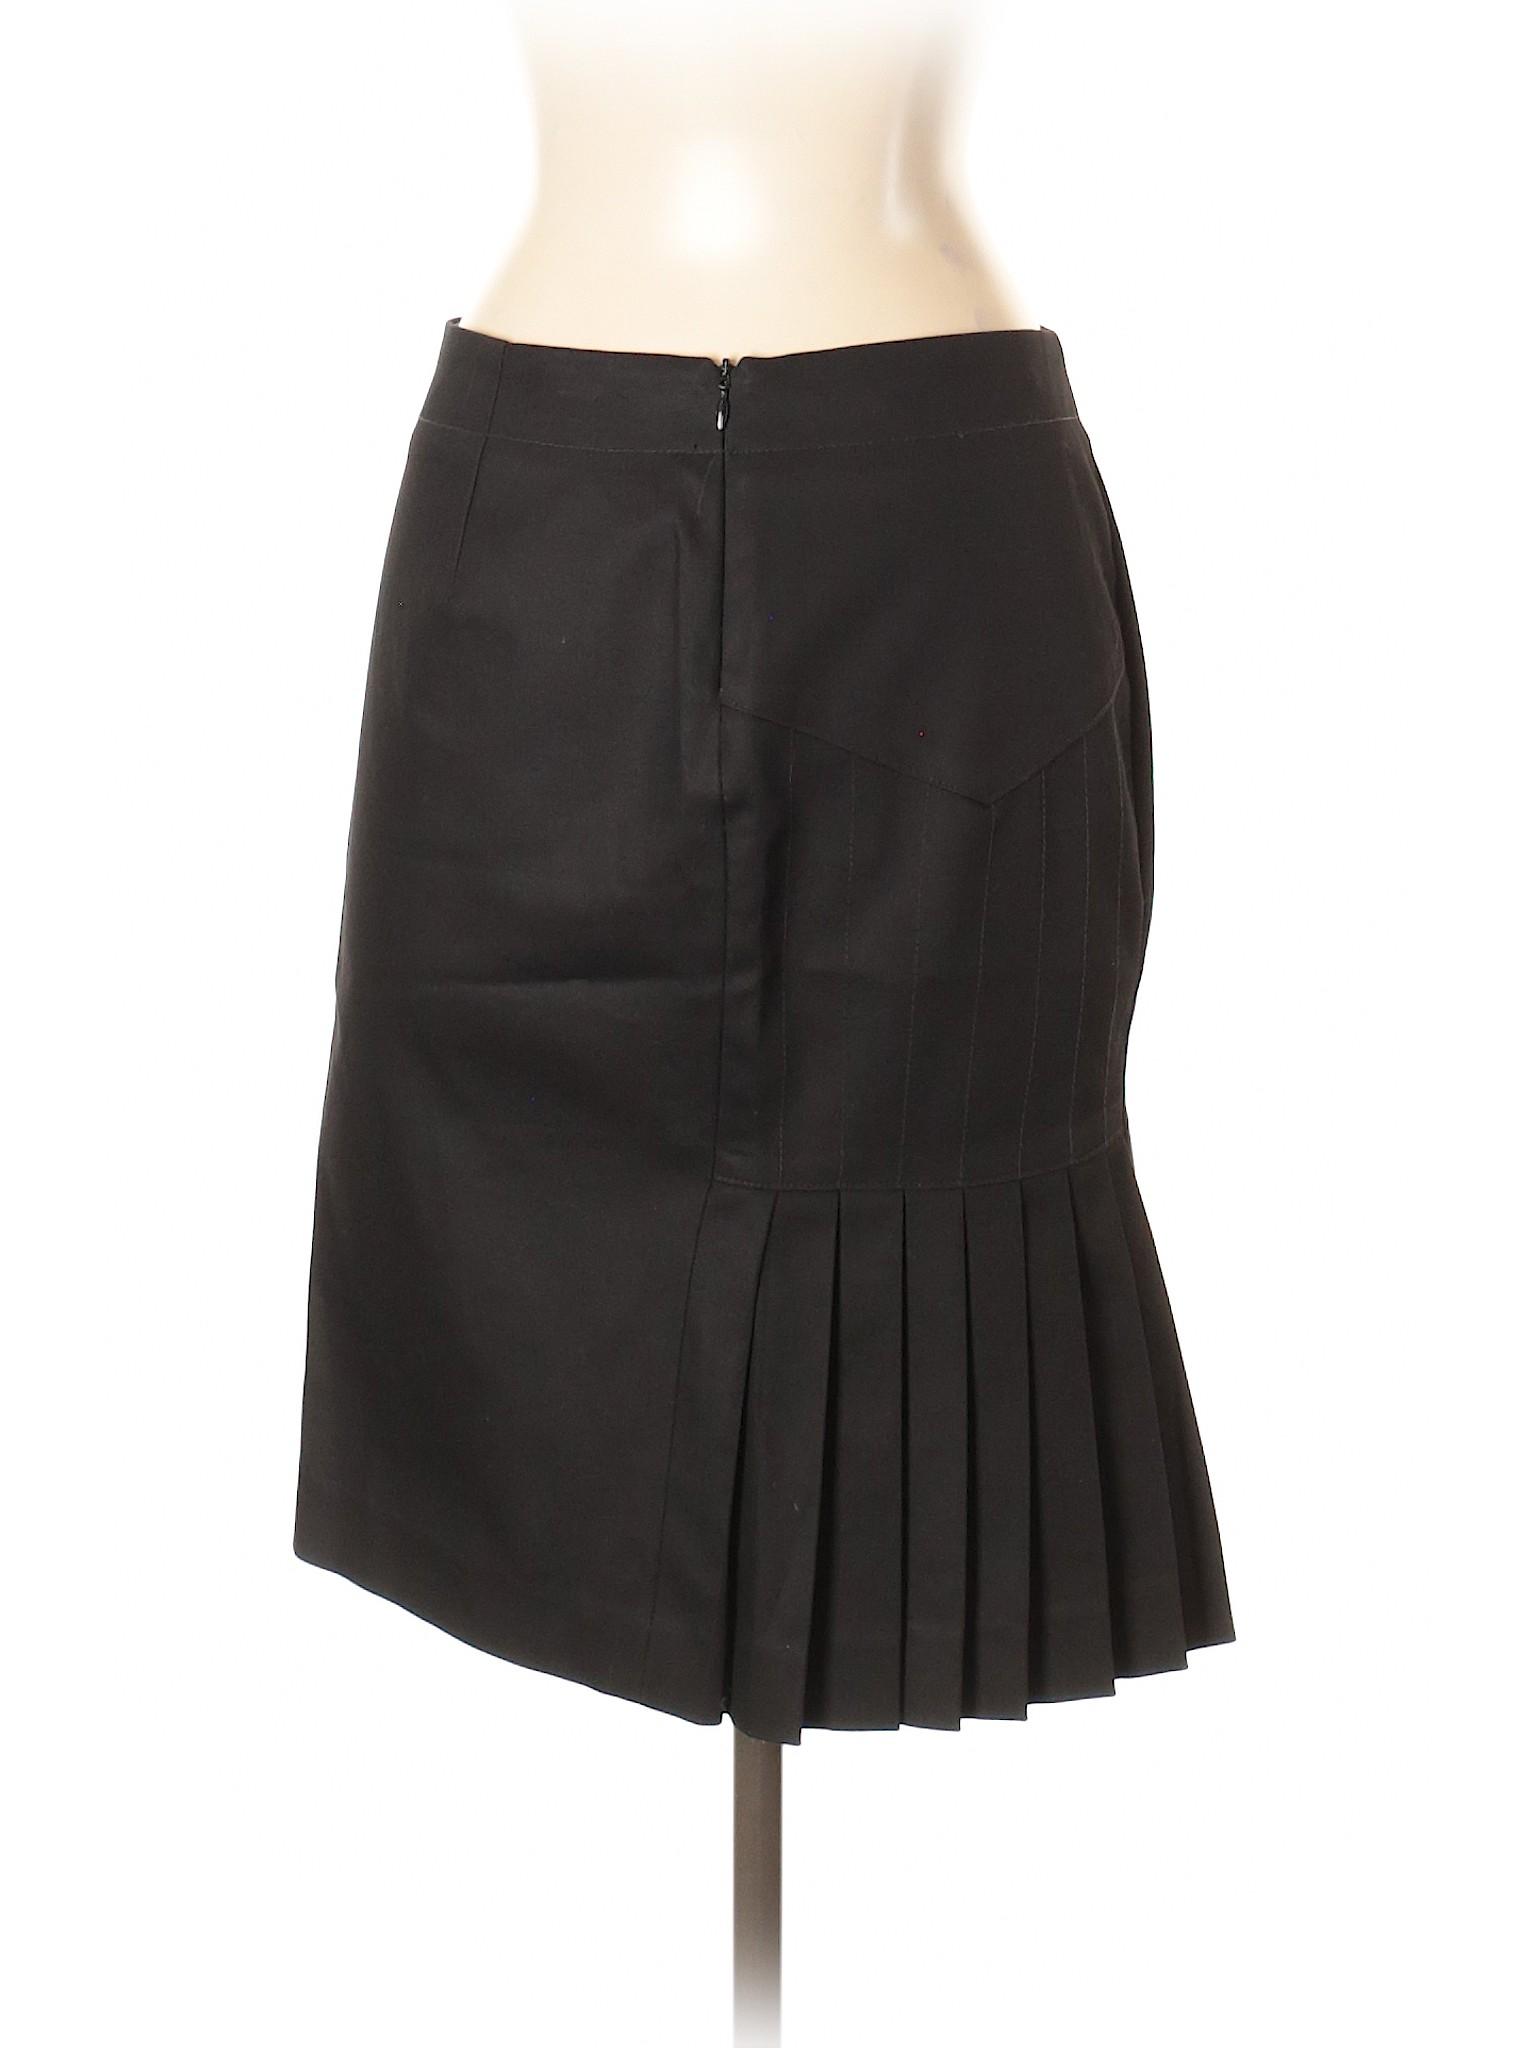 Casual Boutique Skirt Skirt Boutique Boutique Casual Casual 50FqBn5ESx